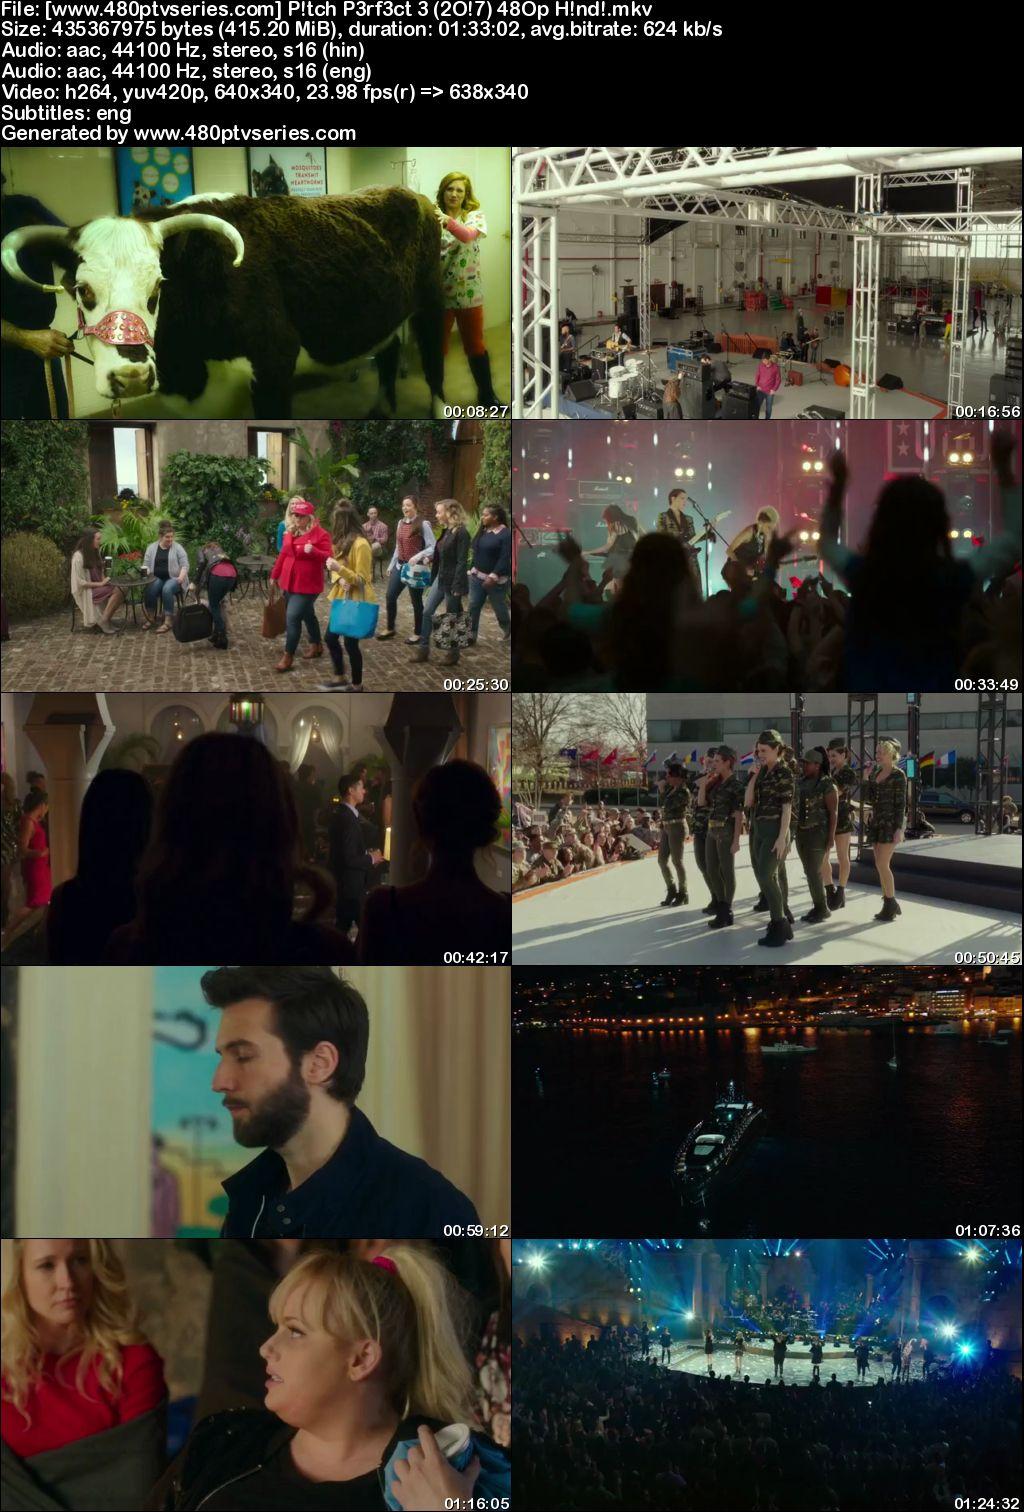 Pitch Perfect 3 (2017) 400MB Full Hindi Dual Audio Movie Download 480p Bluray Free Watch Online Full Movie Download Worldfree4u 9xmovies